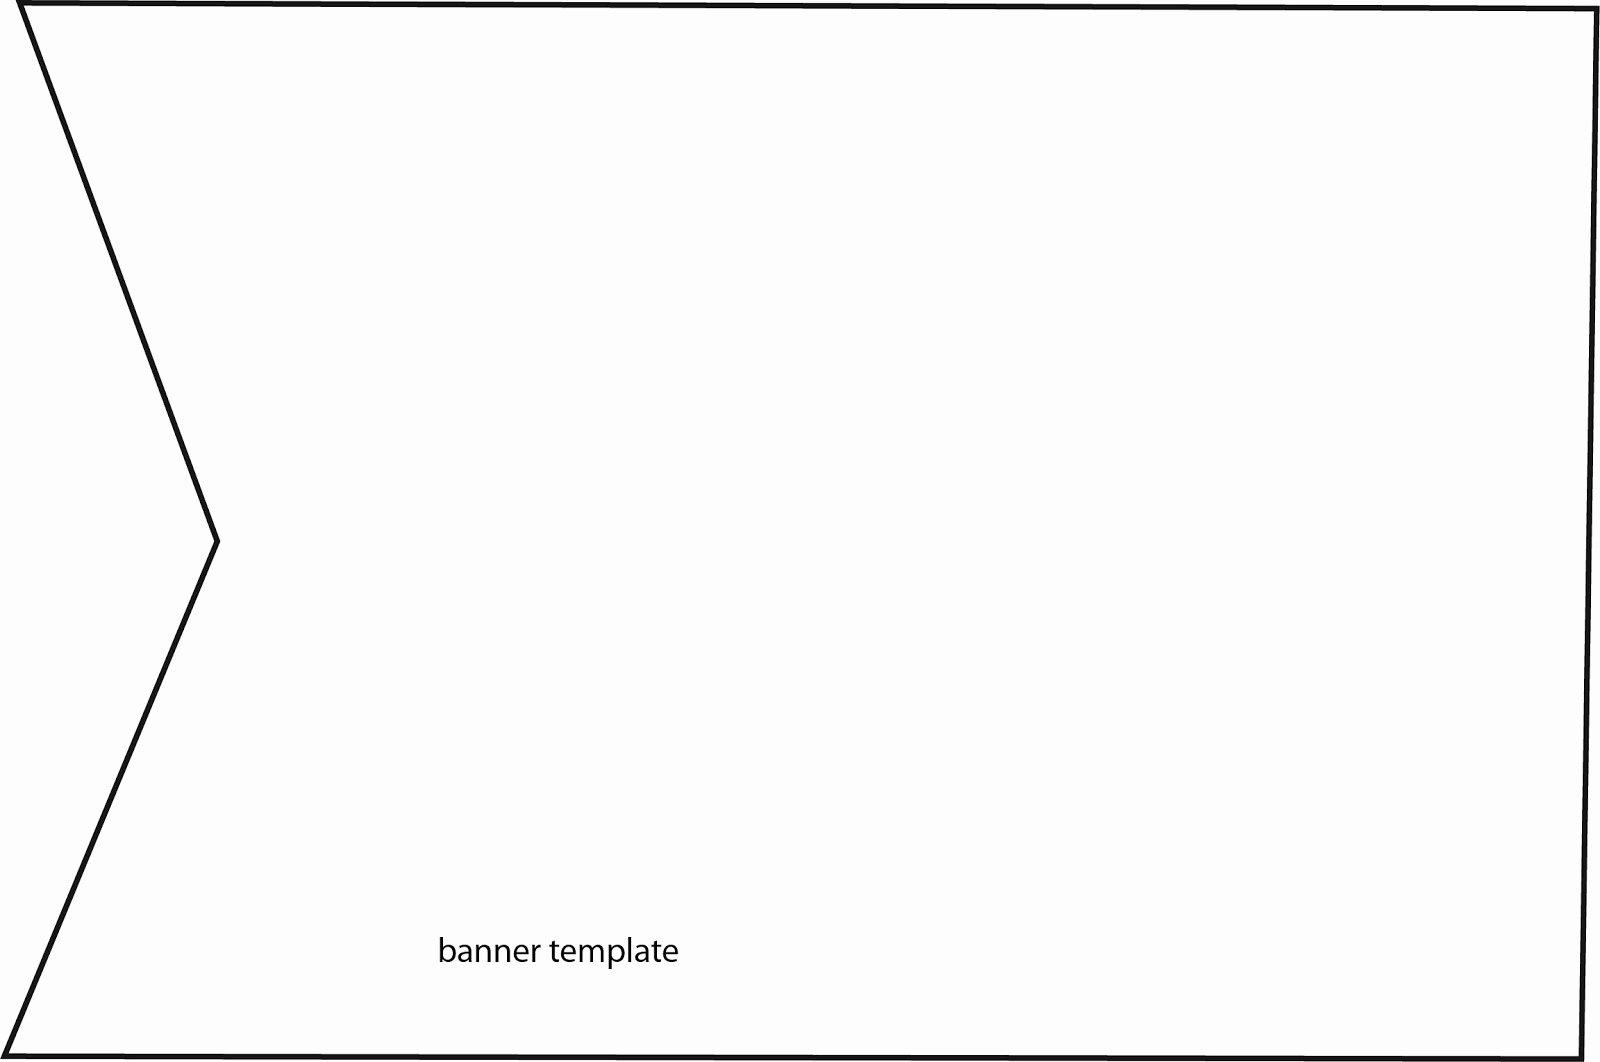 Printable Pennant Banner Template Lovely Bobunny 5 26 13 6 2 13